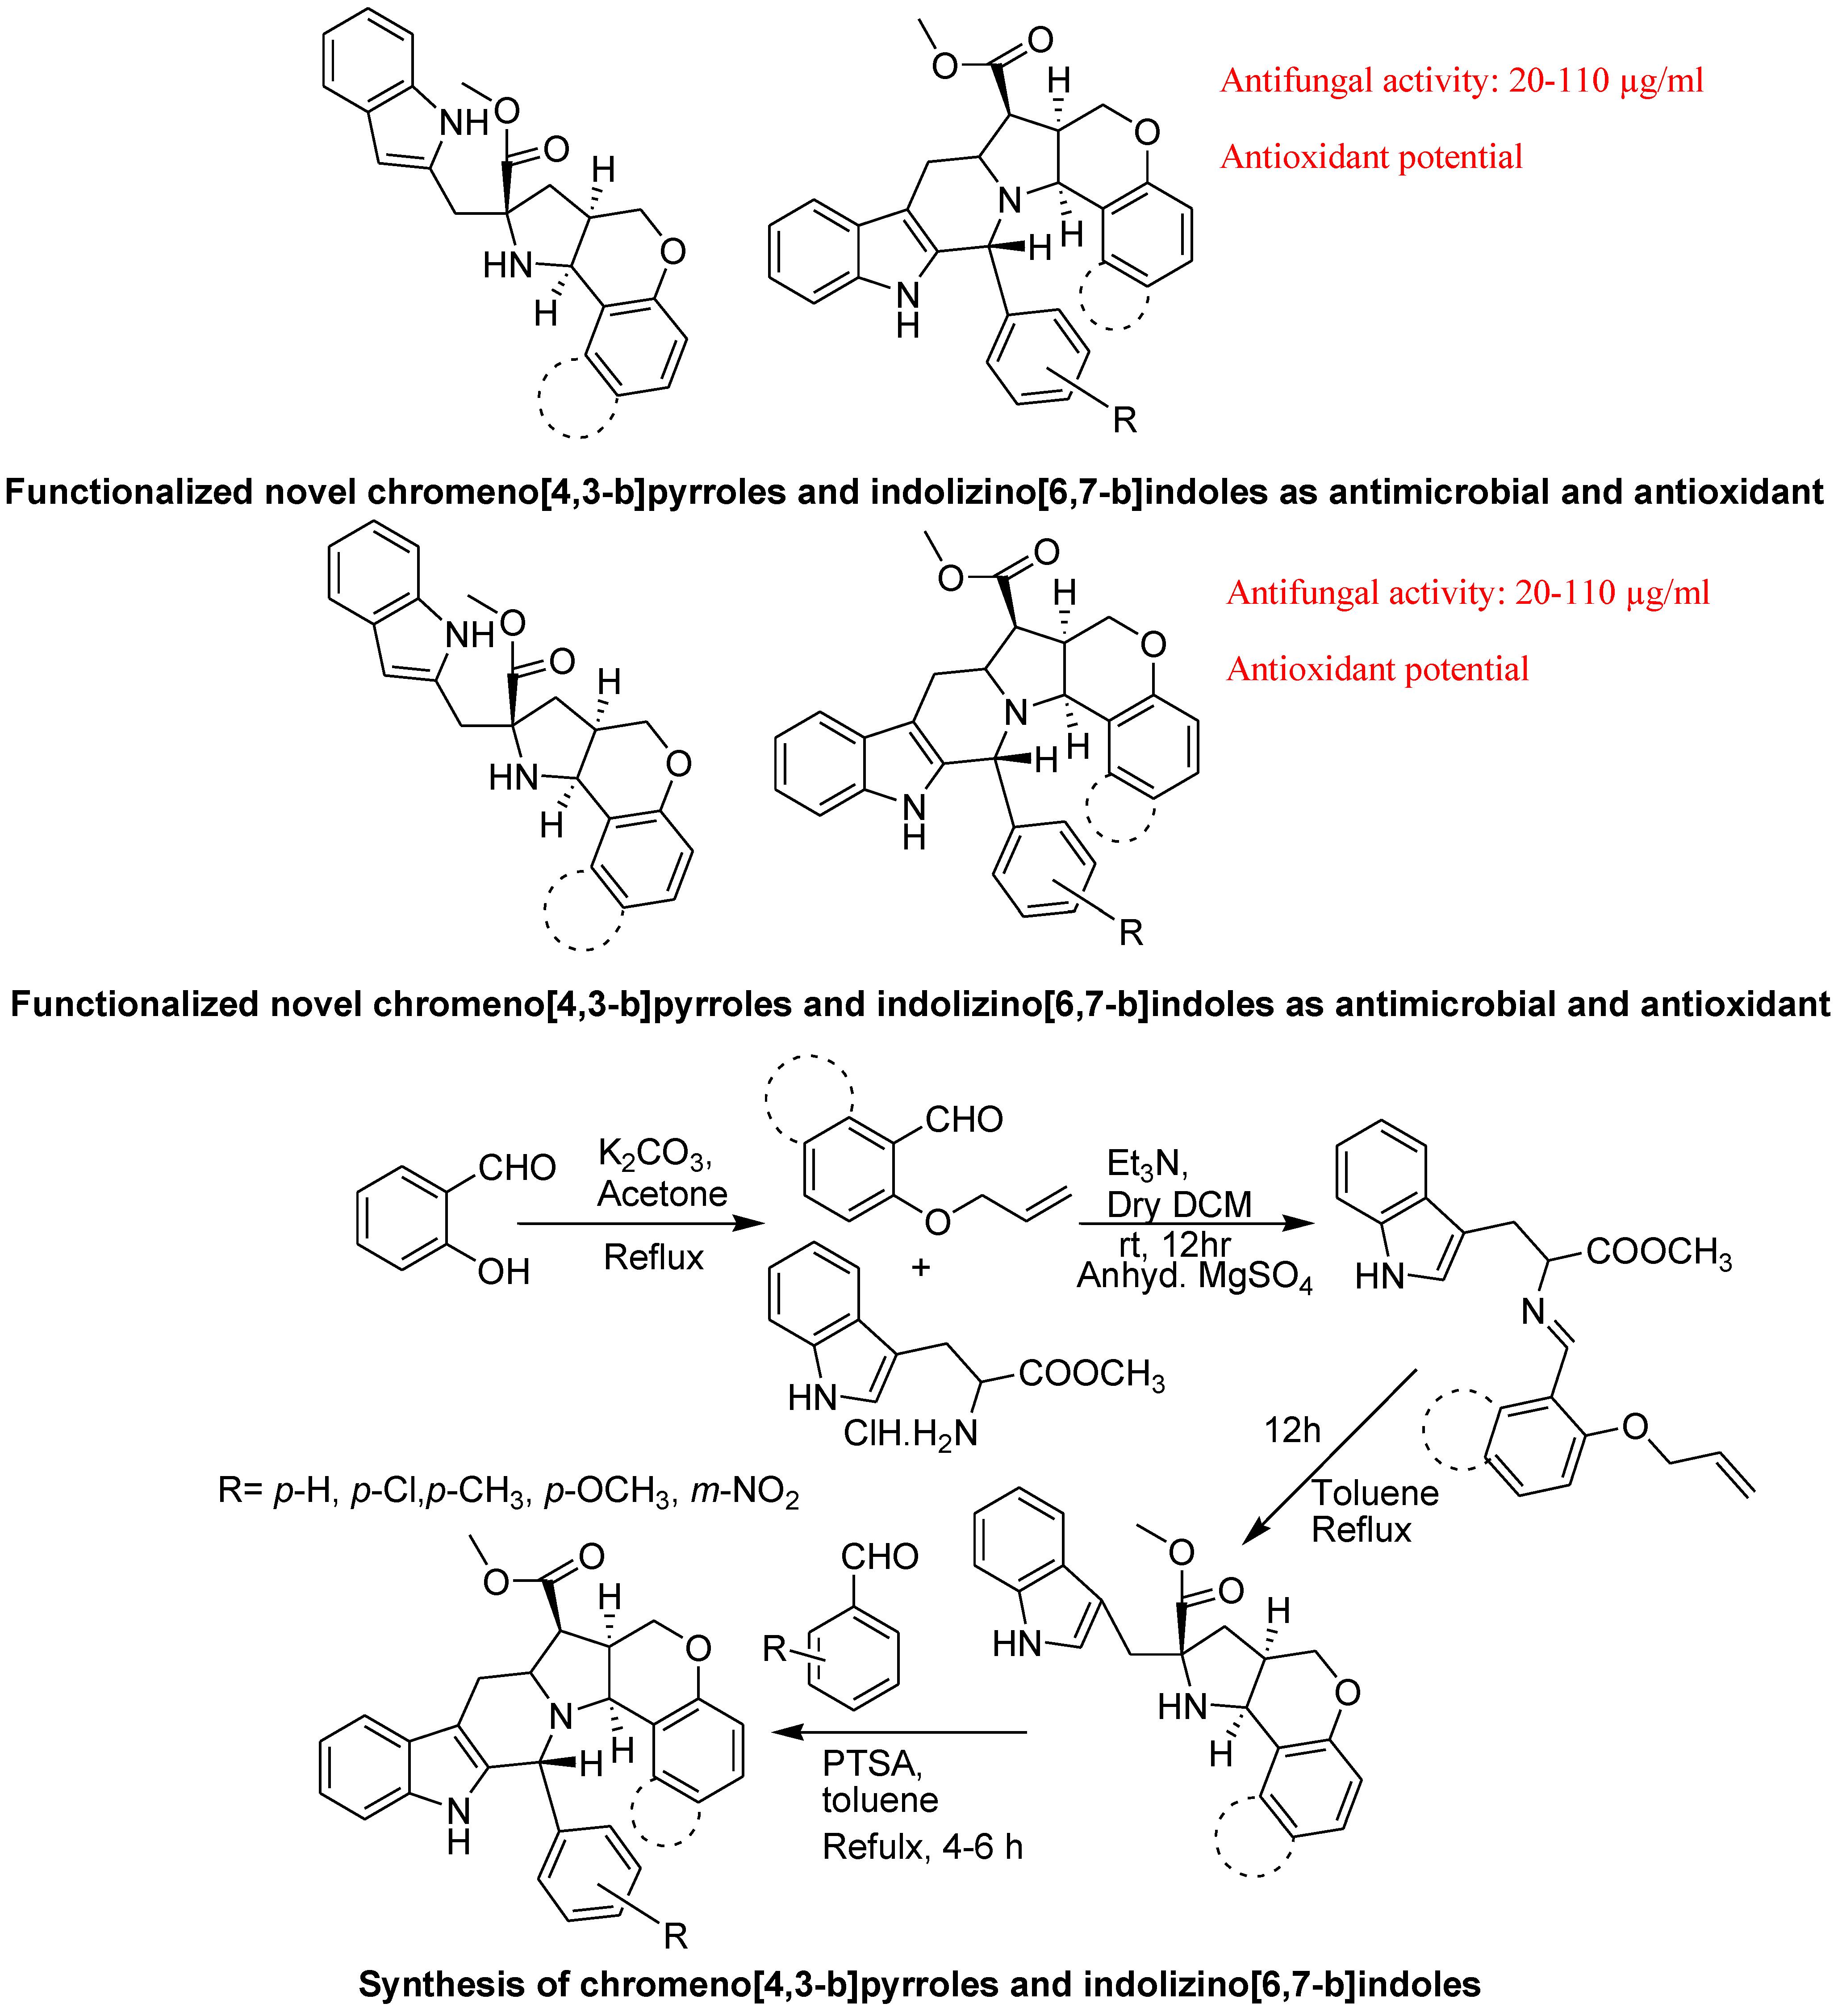 doxorubicin structure activity relationship of indole